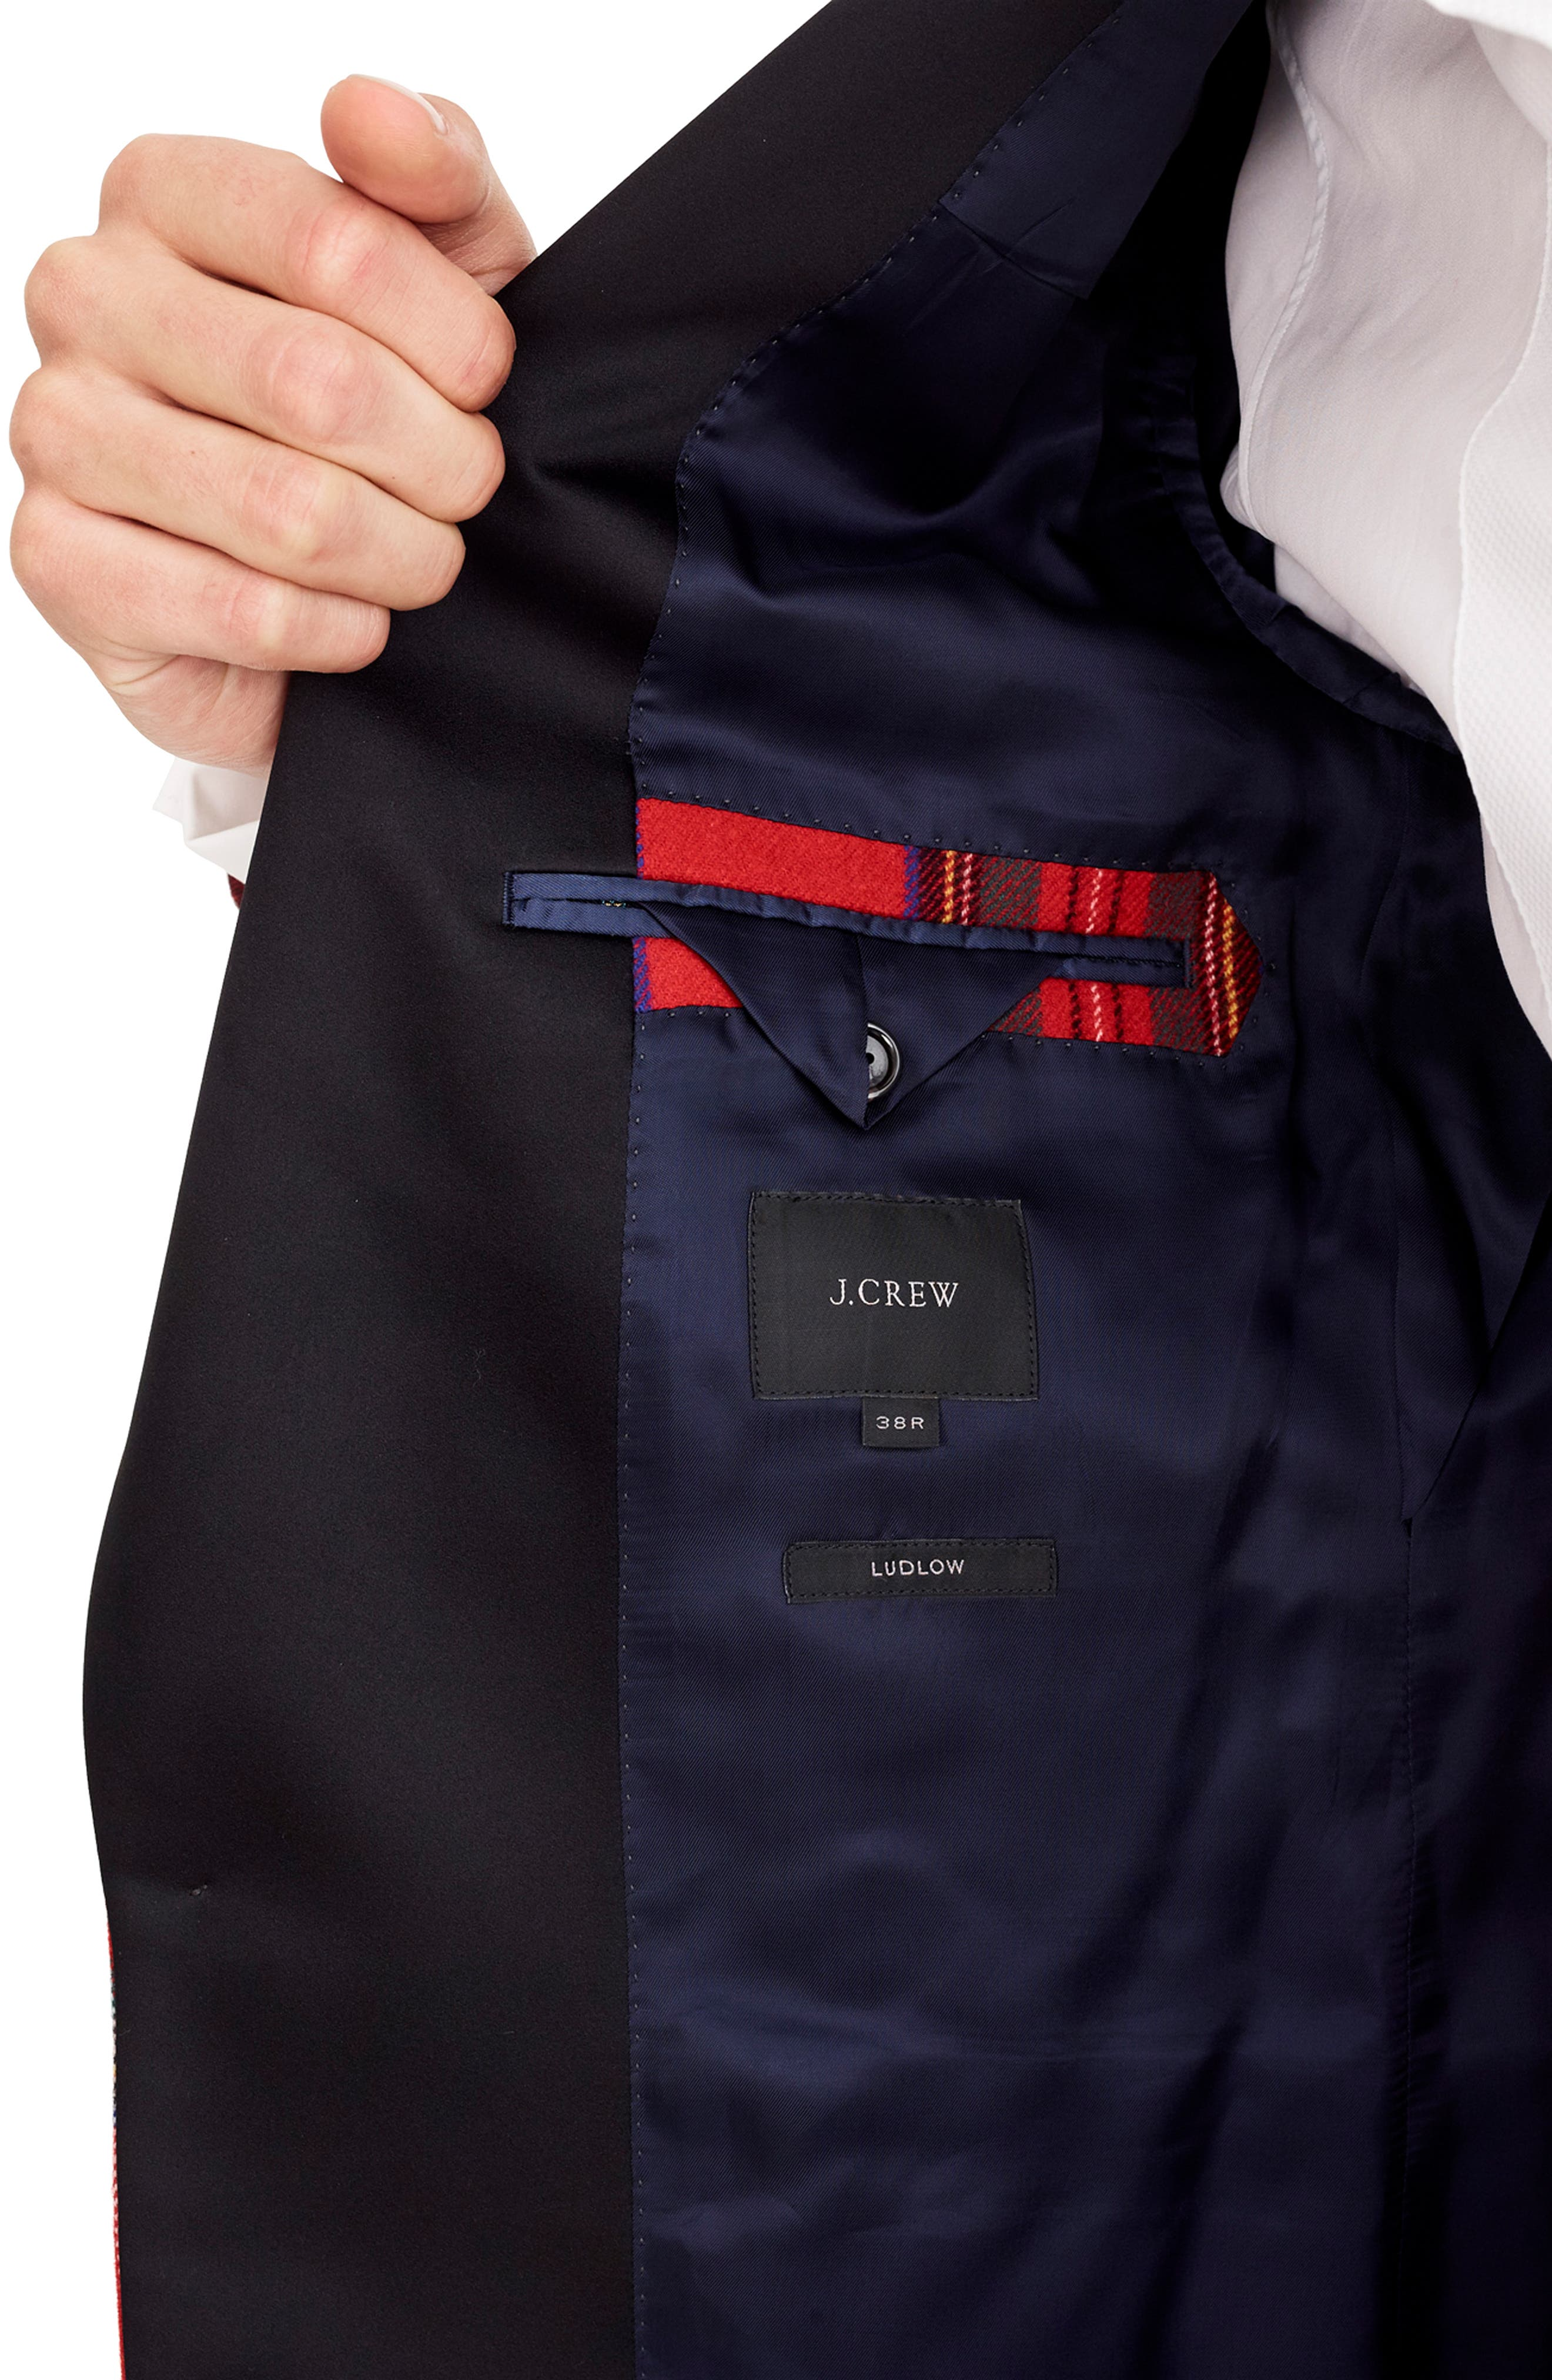 J.CREW,                             Ludlow Slim Fit Tartan Wool Blend Dinner Jacket,                             Alternate thumbnail 4, color,                             600